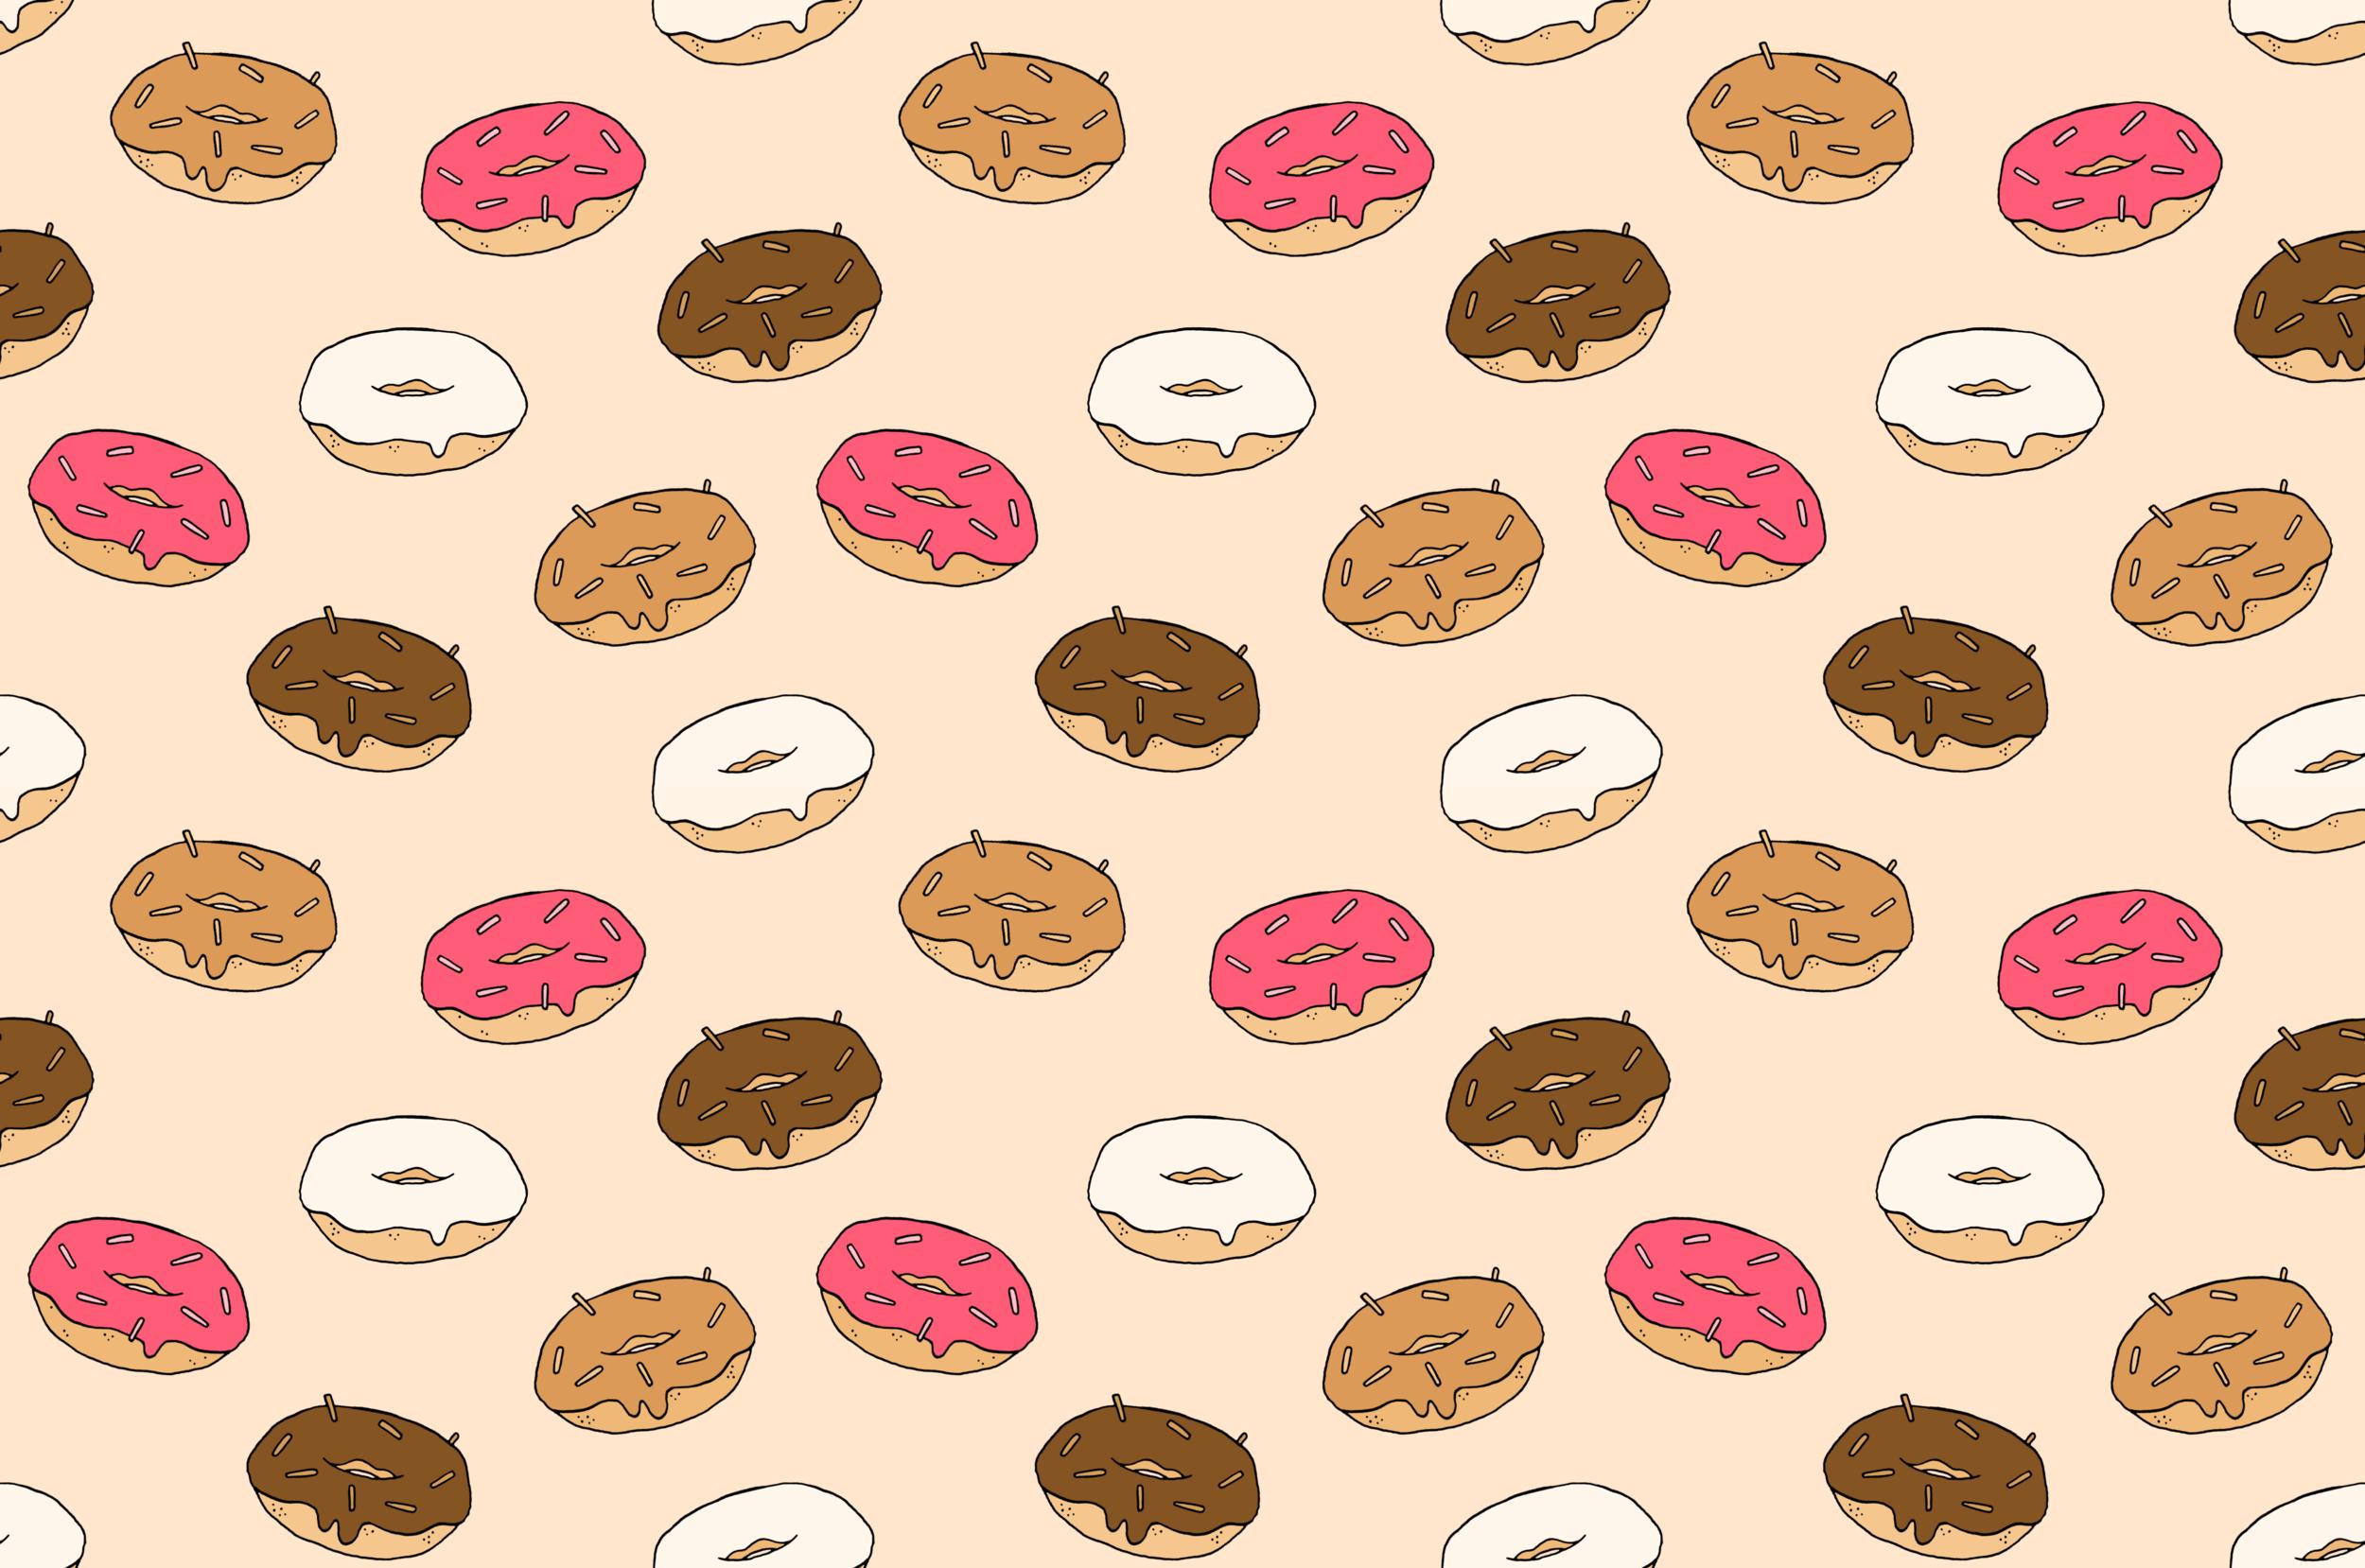 Donut repeat pattern